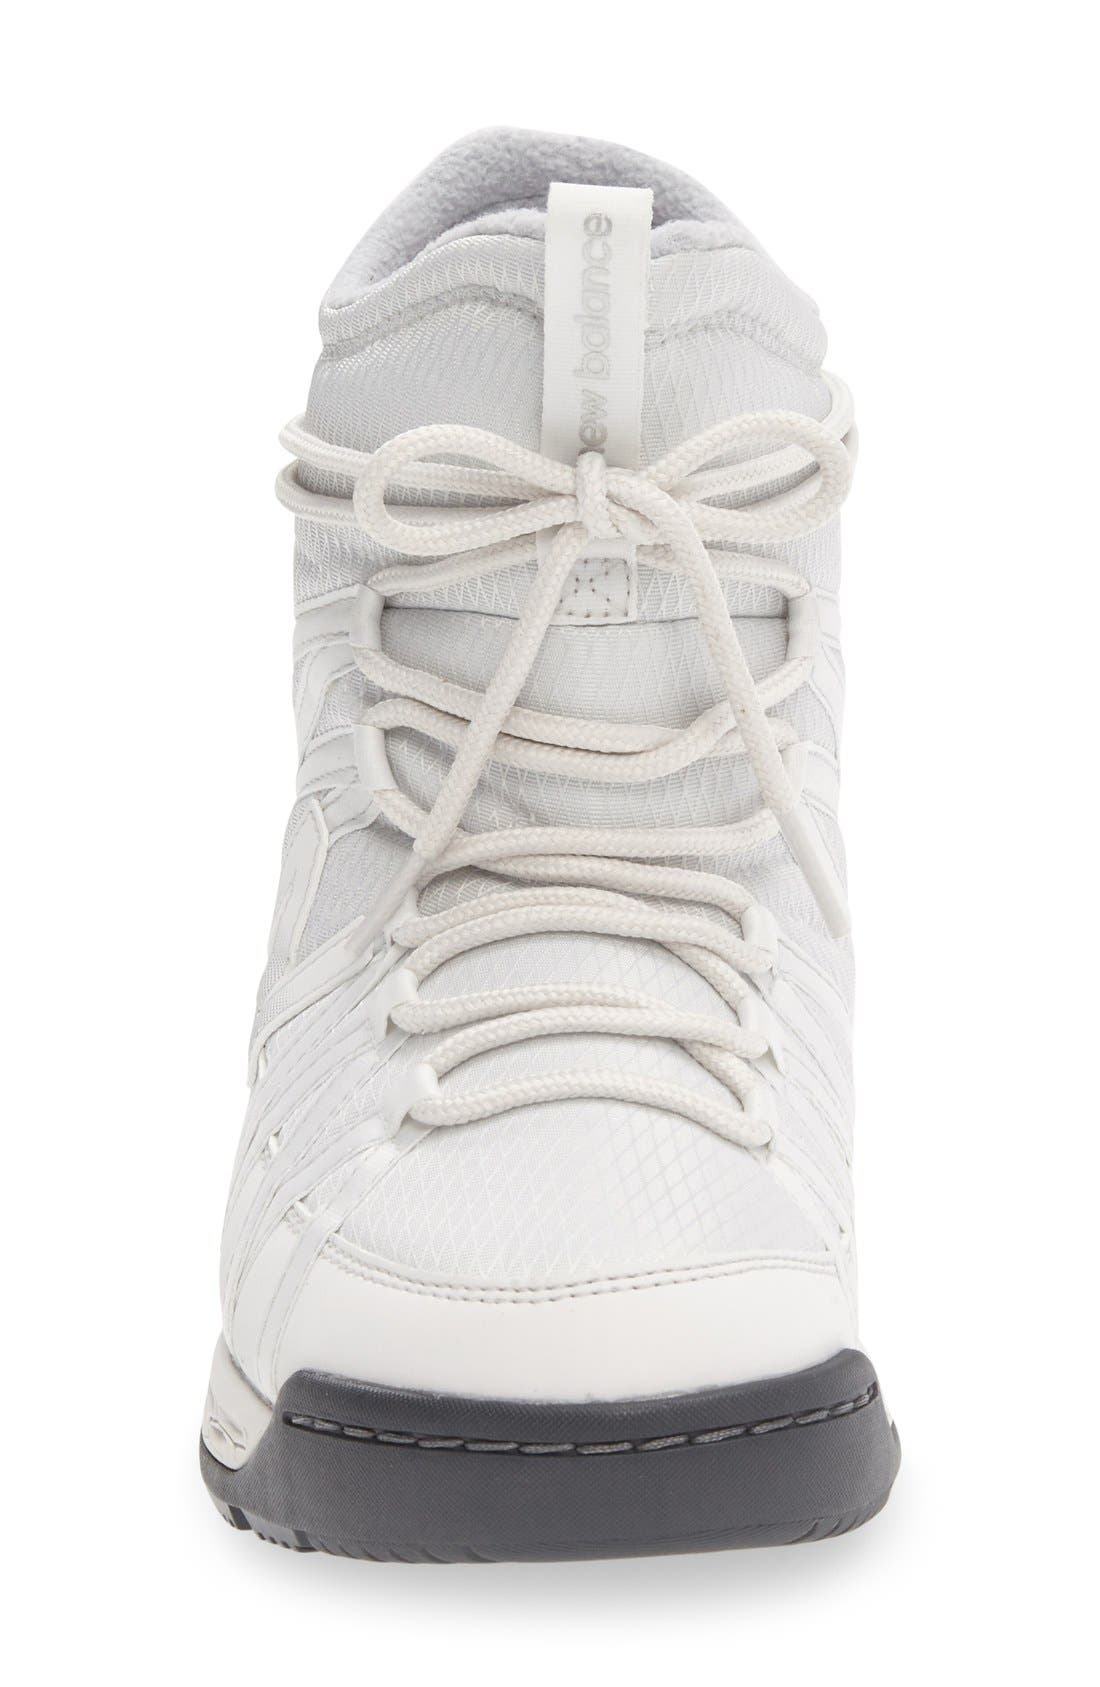 Q416 Weatherproof Snow Boot,                             Alternate thumbnail 3, color,                             White